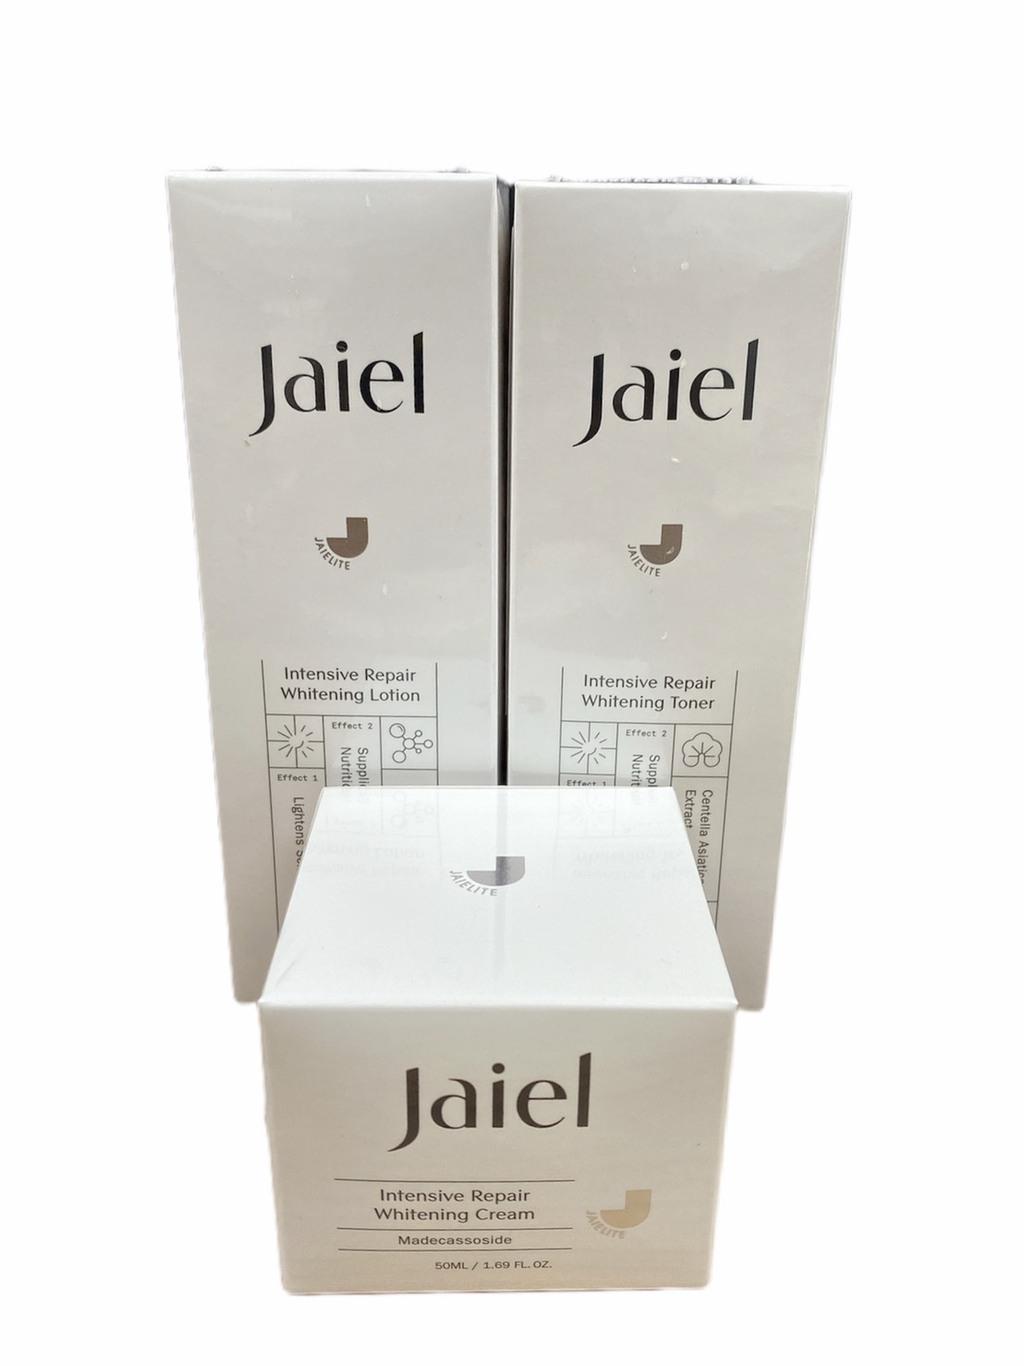 Jaiel Intensive Repair Whitening บำรุงผิวหน้าอย่างครบสูตร รีวิว